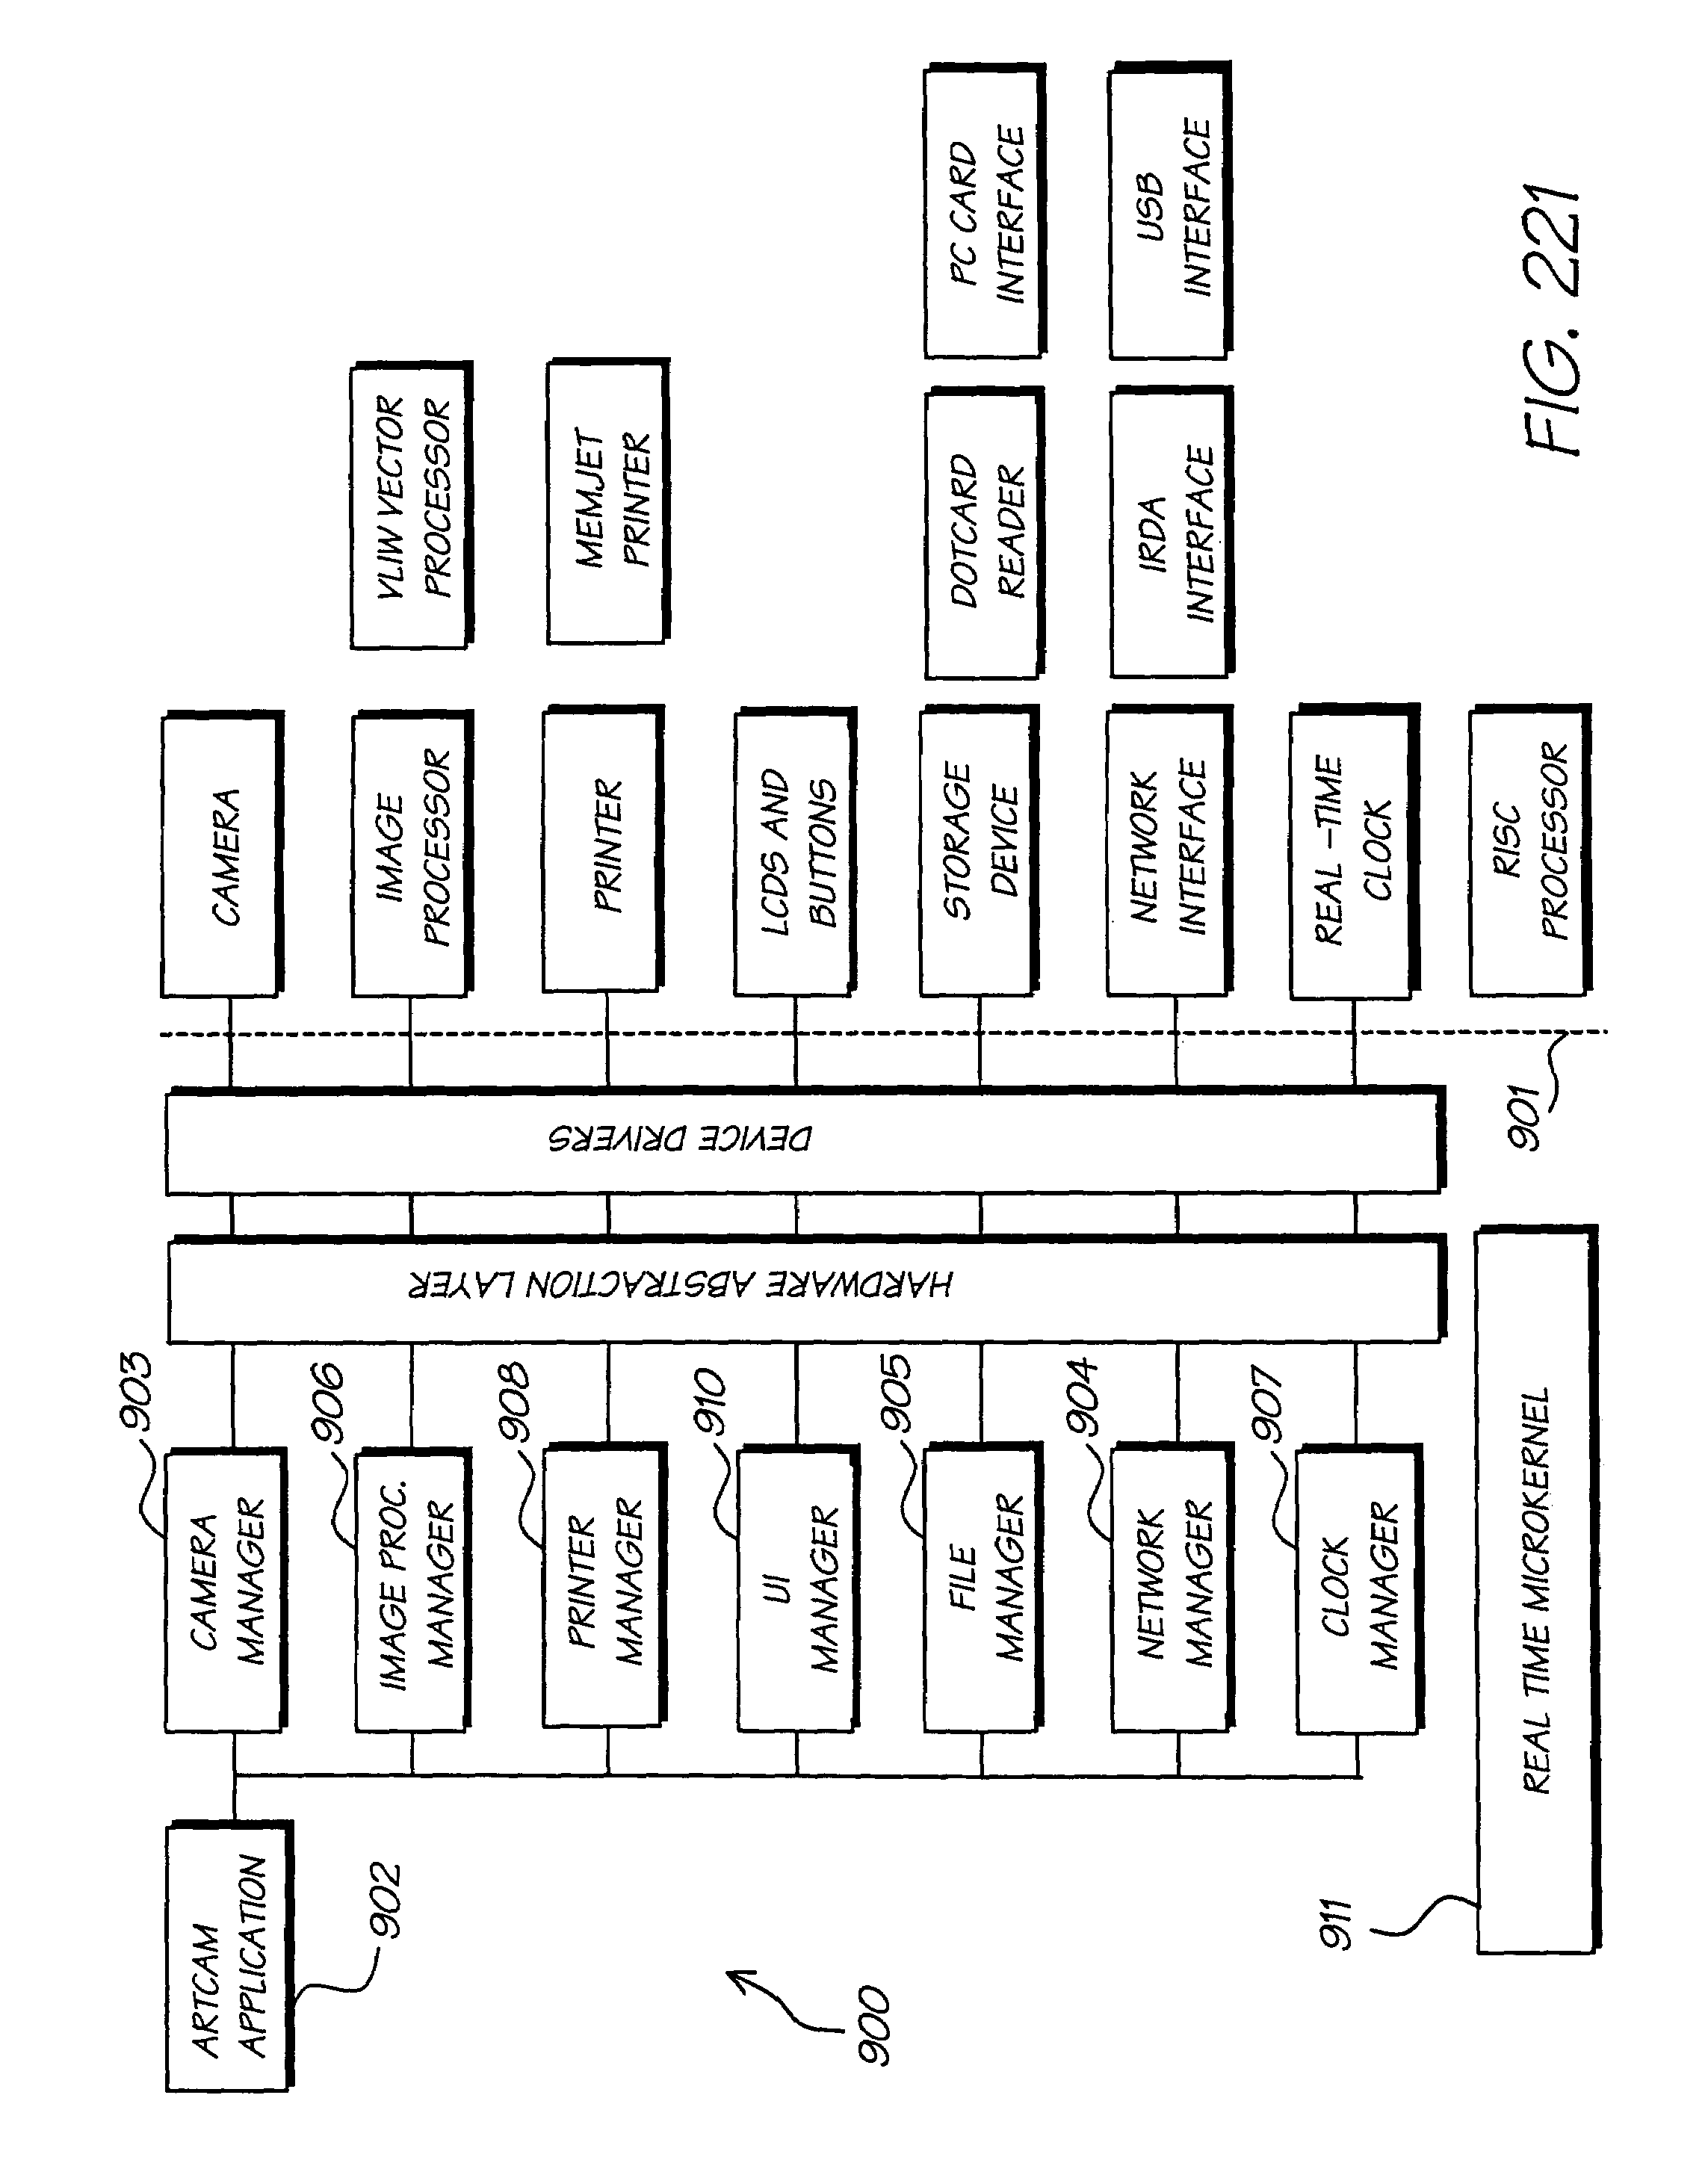 Patent US 7,193,482 B2